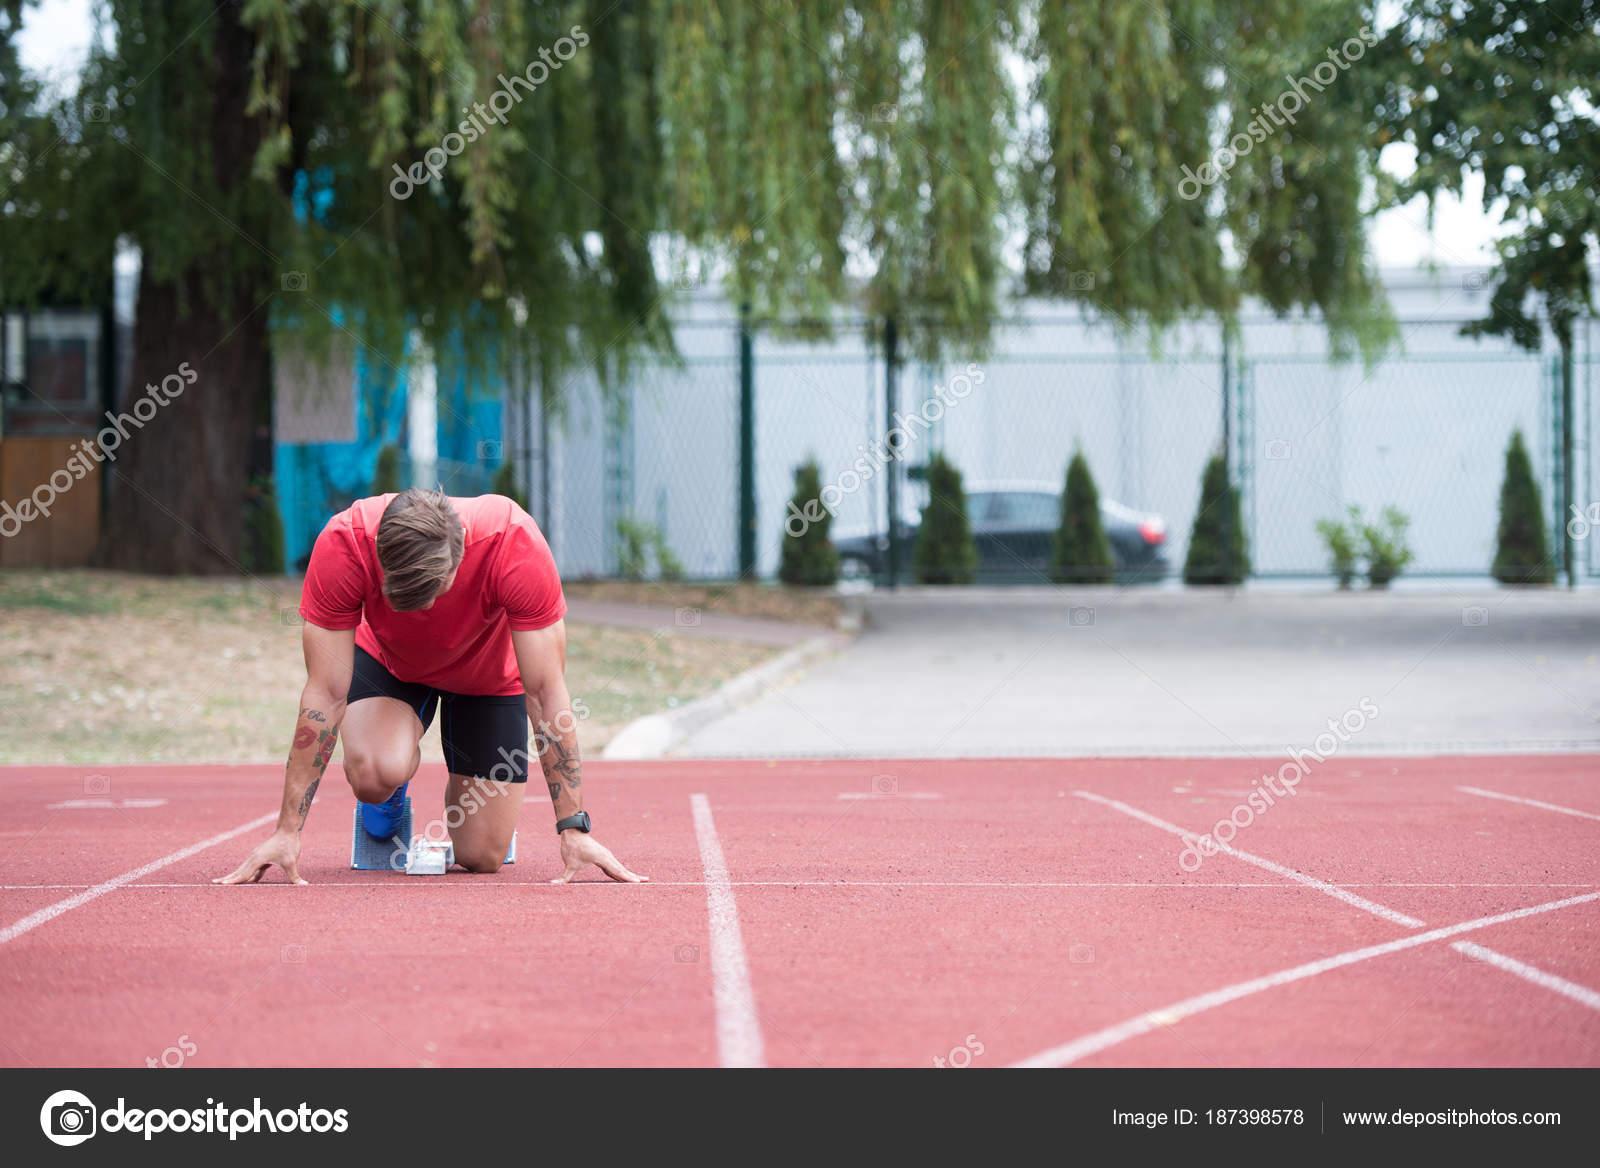 c8823bcccbb Manliga Sprinter redo att starta loppet — Stockfotografi © ibrak ...